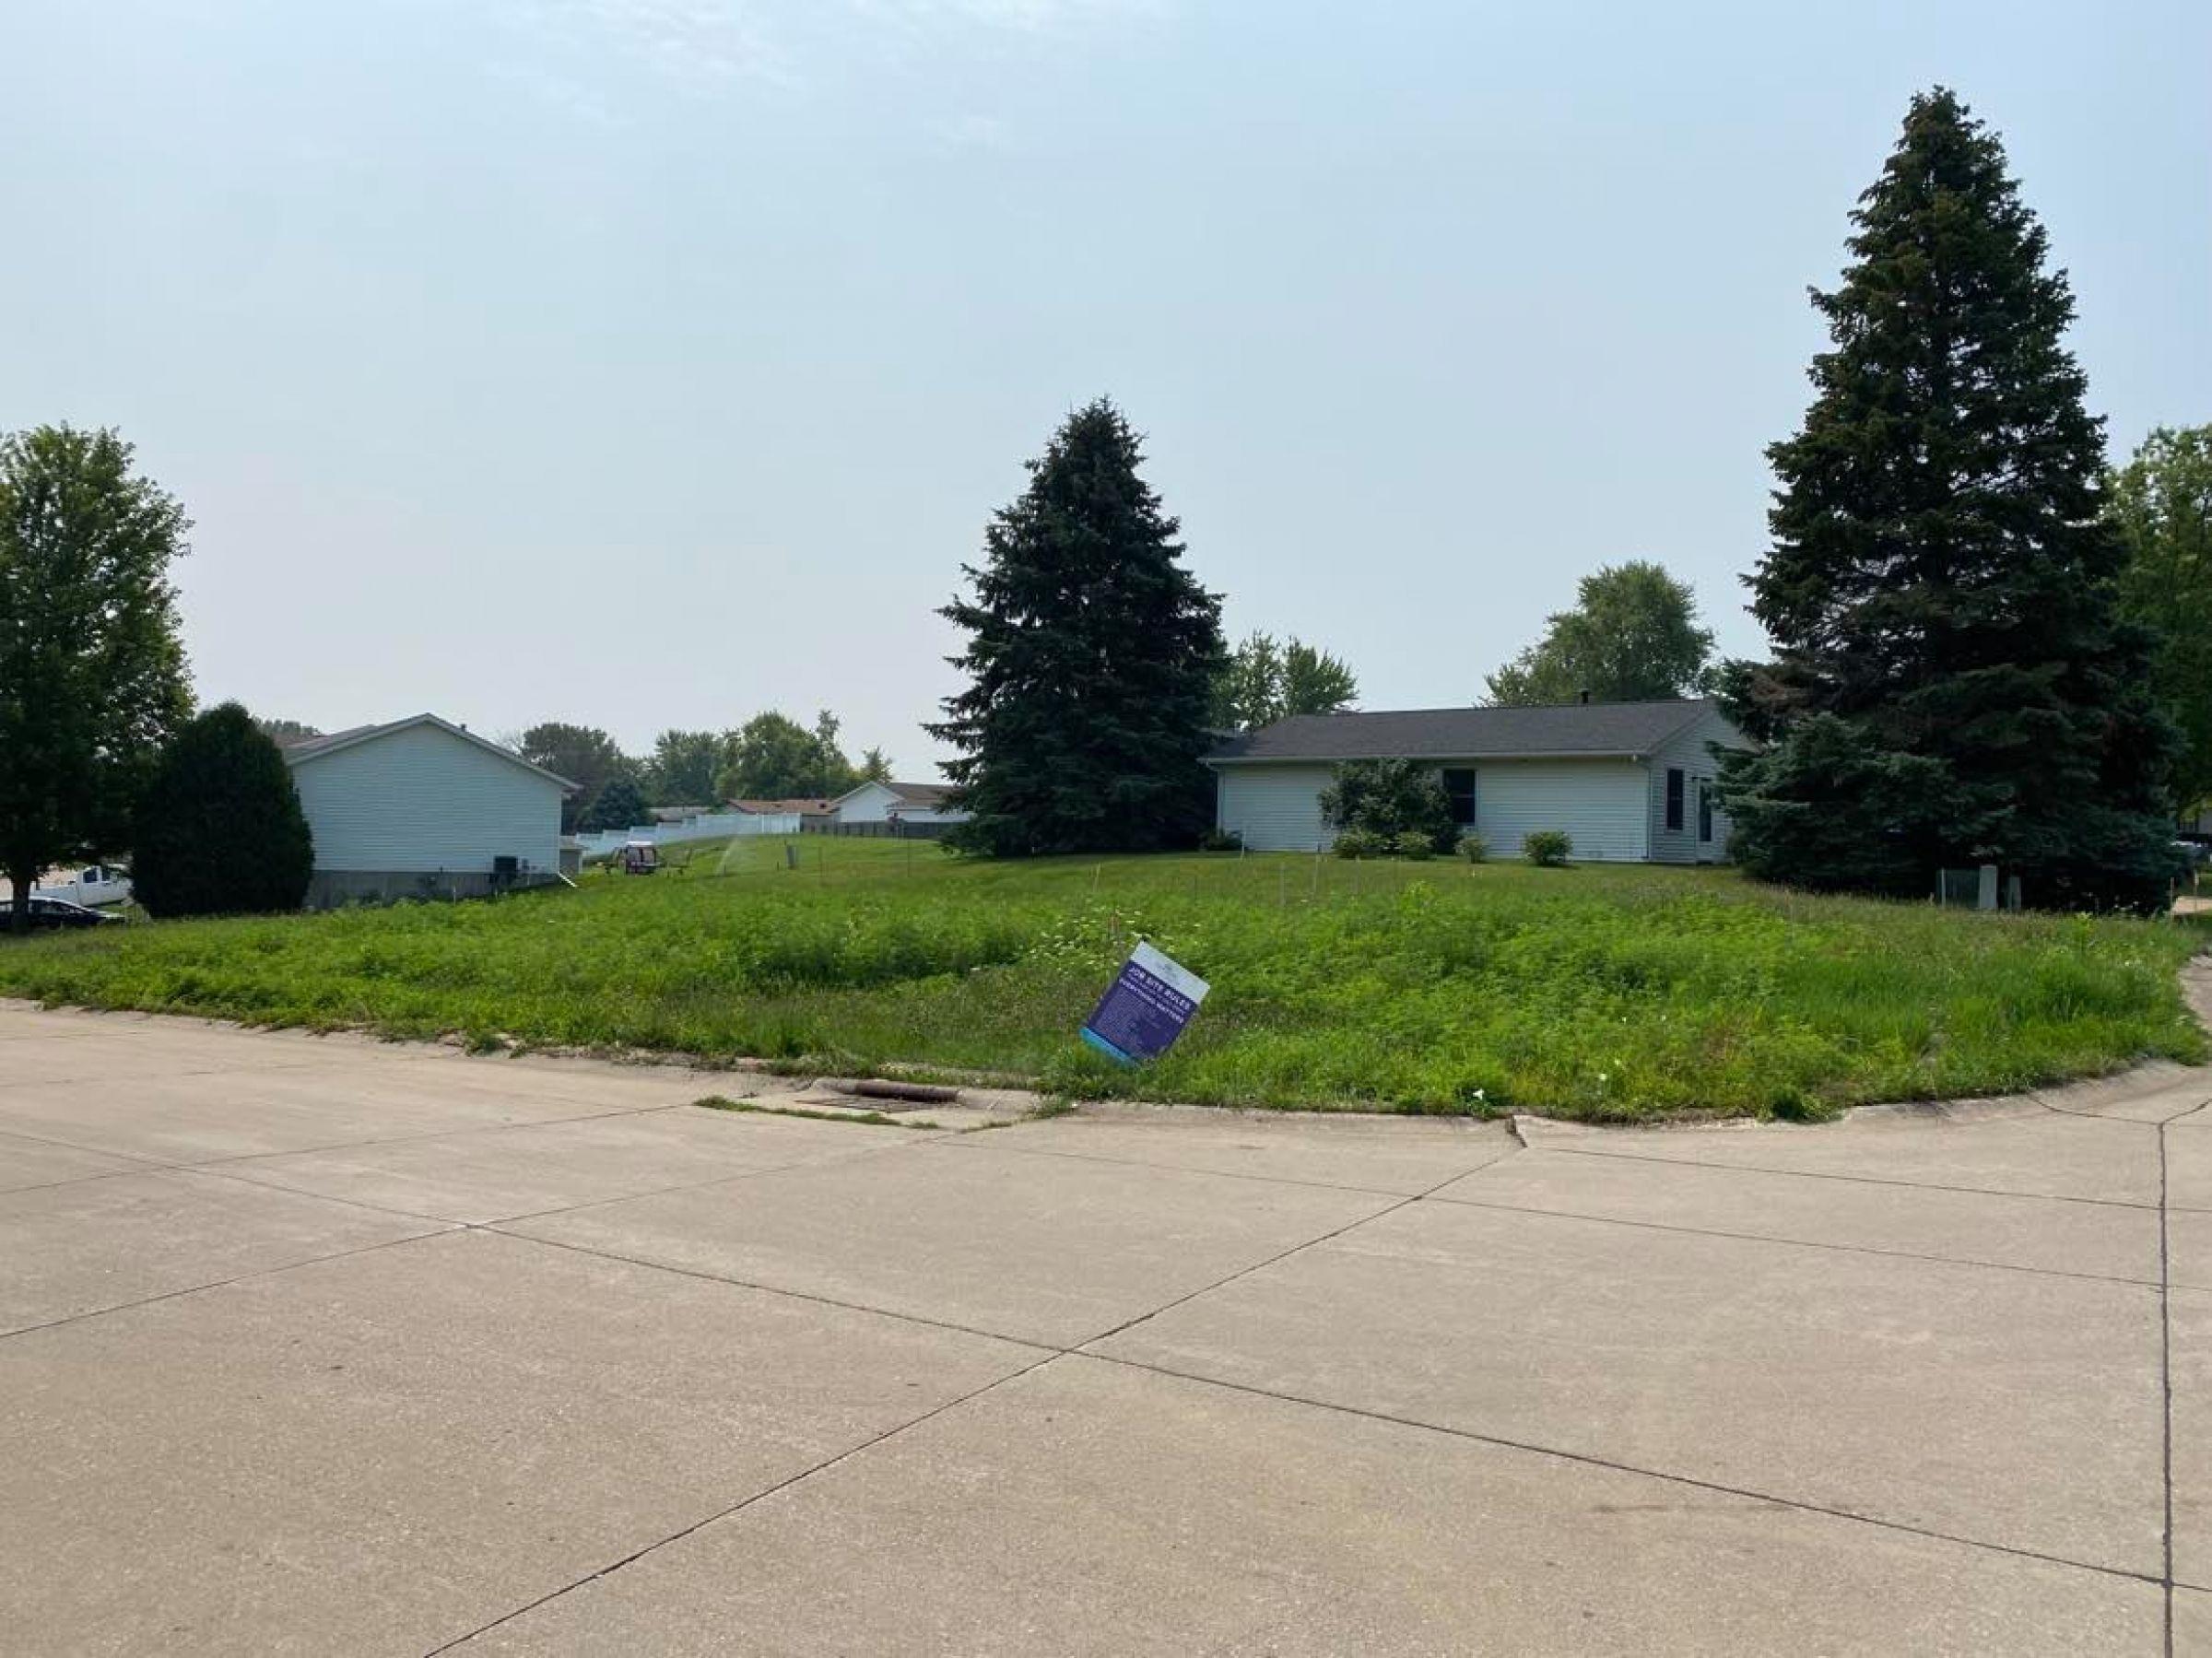 development-land-scott-county-iowa-0-acres-listing-number-15767-6-2021-09-22-040117.jpg